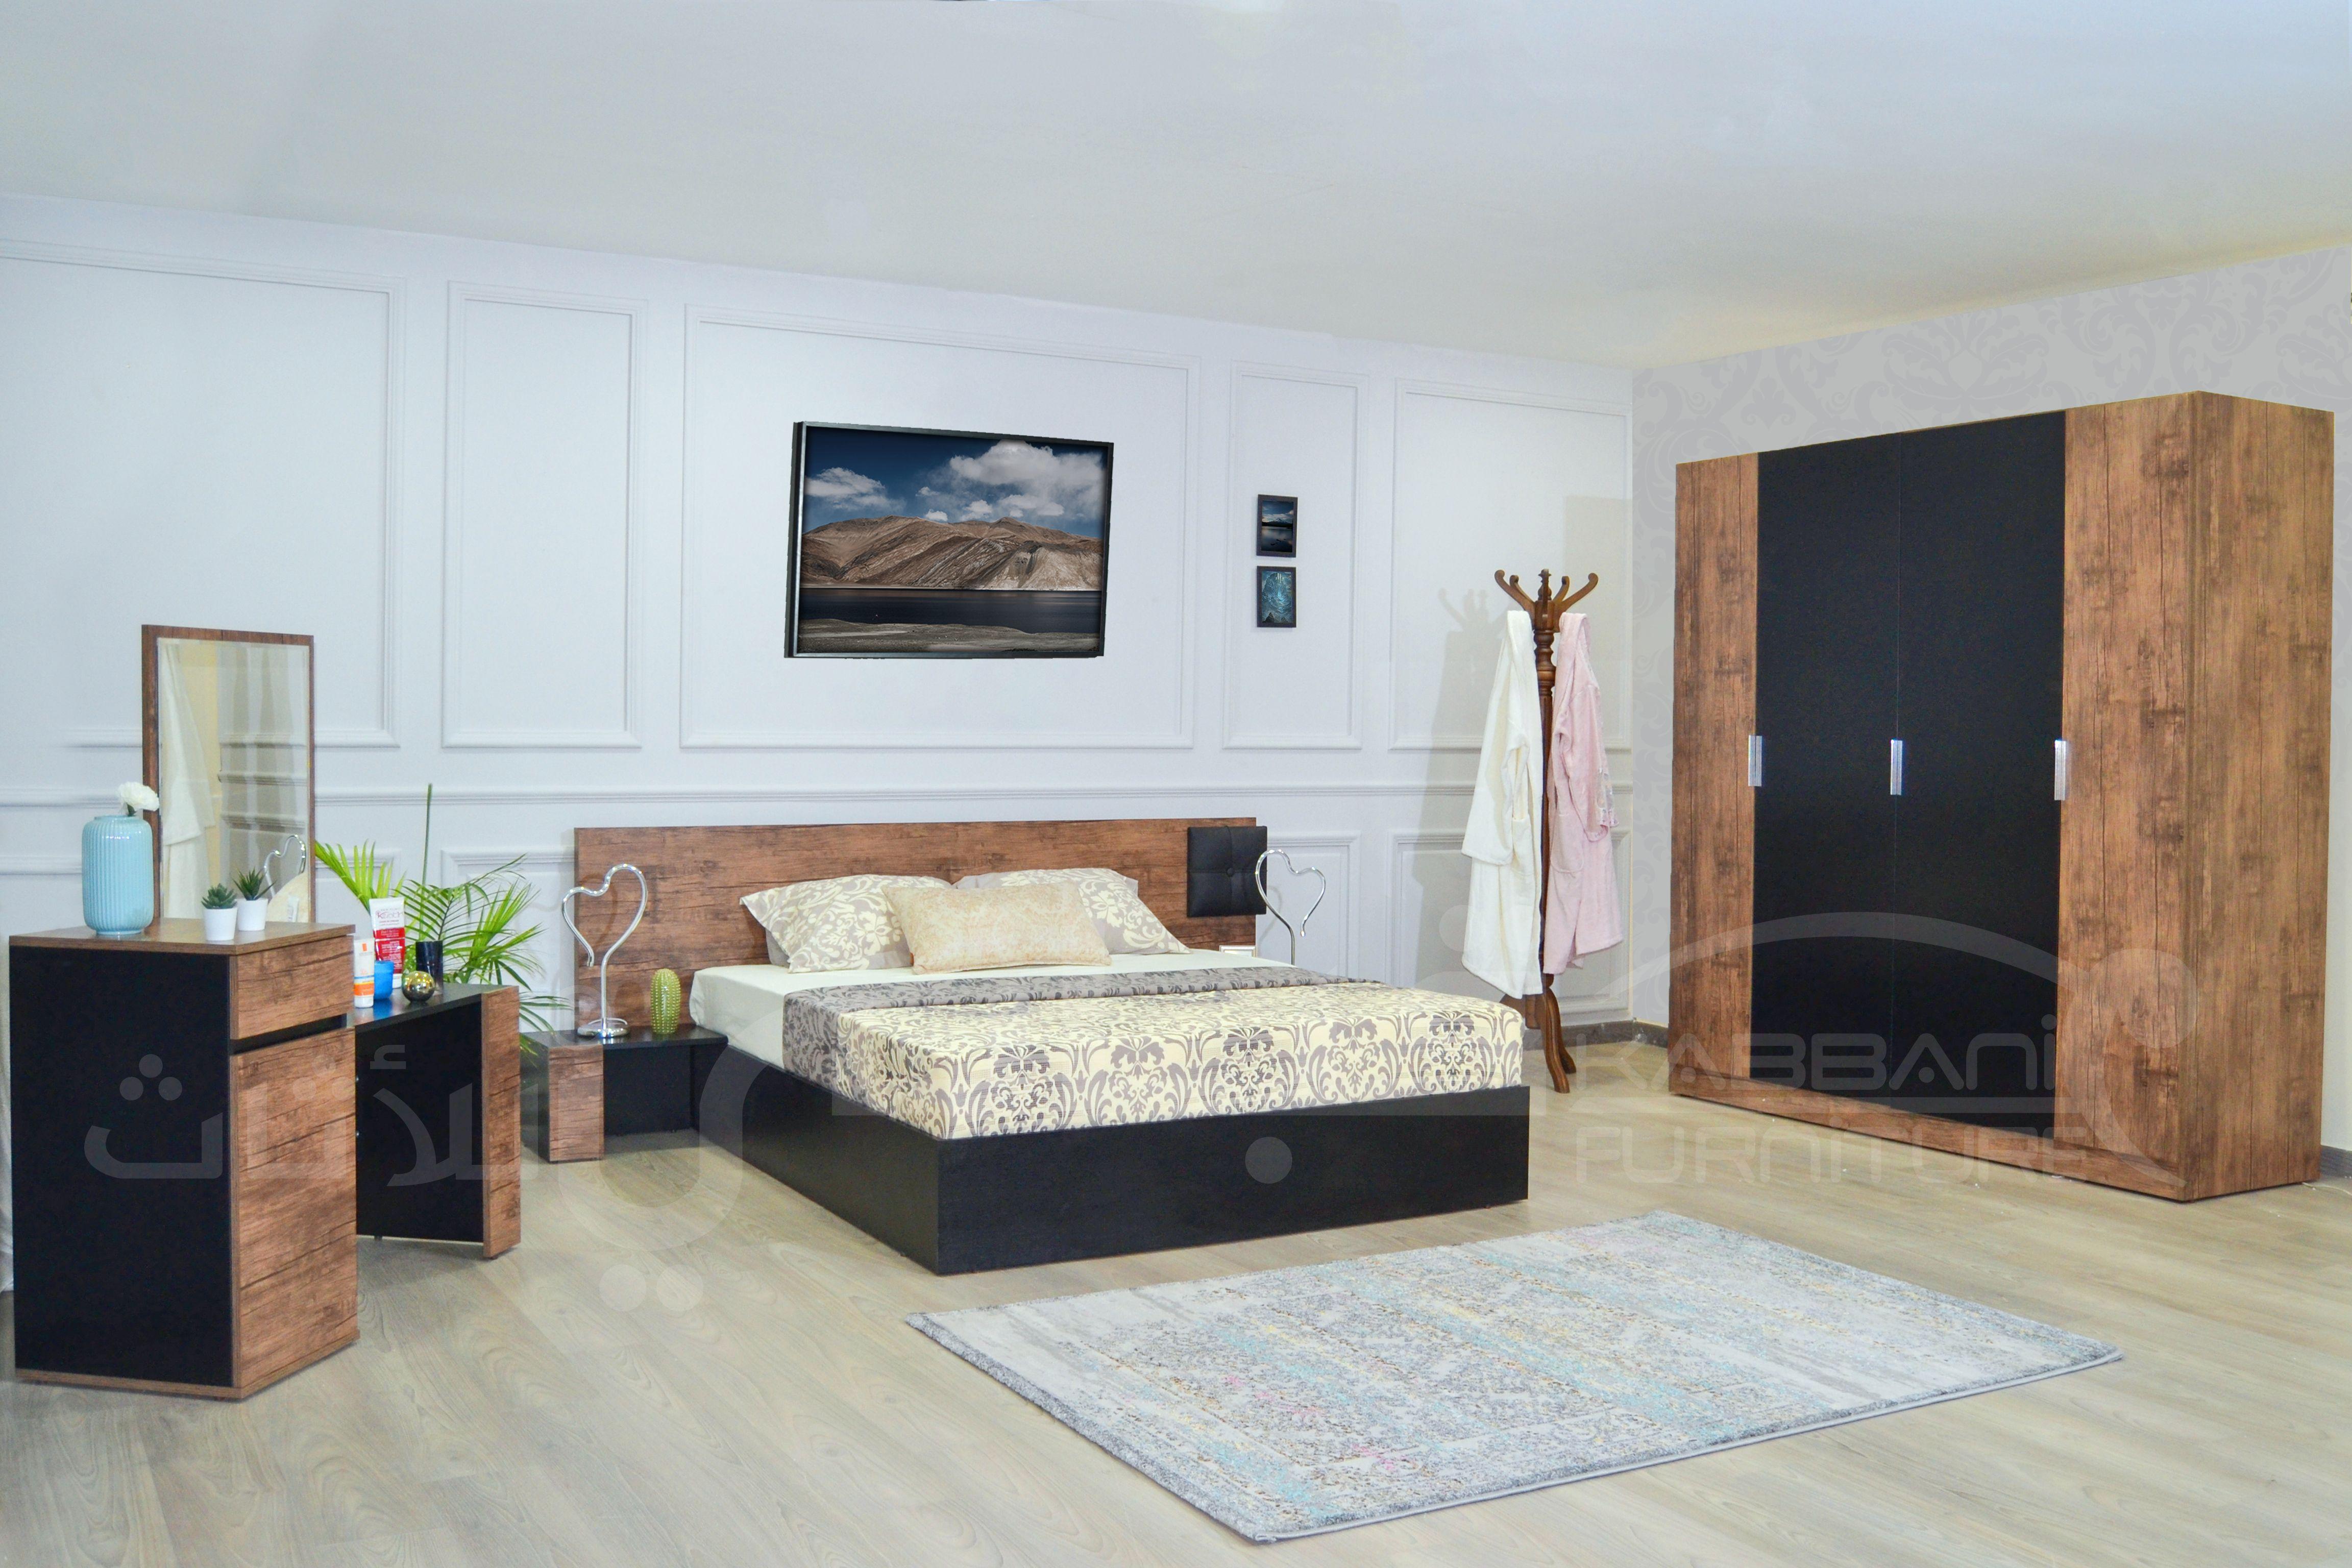 غرفة نوم جلاكسي Furniture Home Bedroom